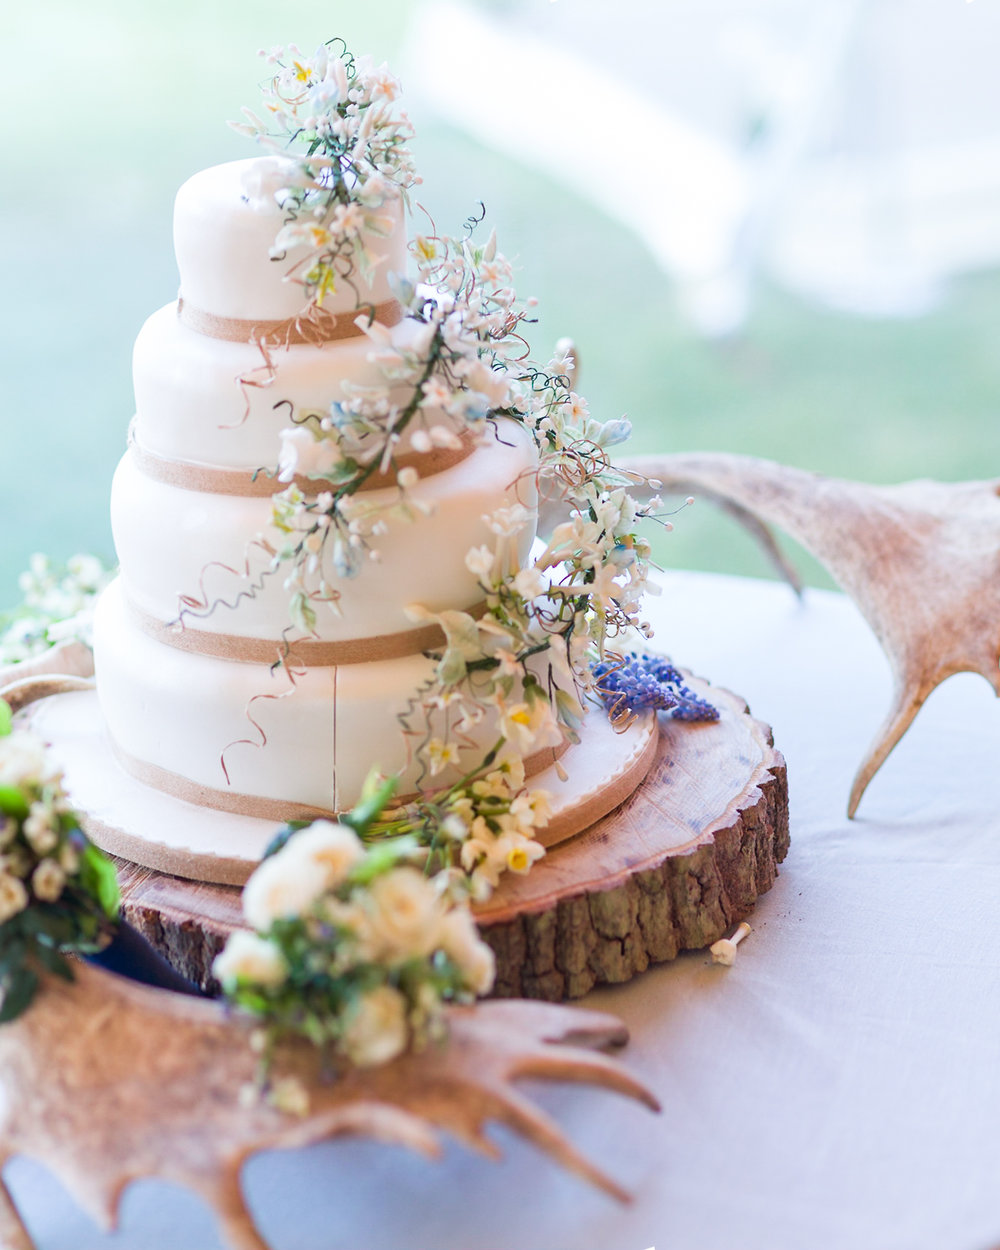 wedding photography cake-1-11.jpg